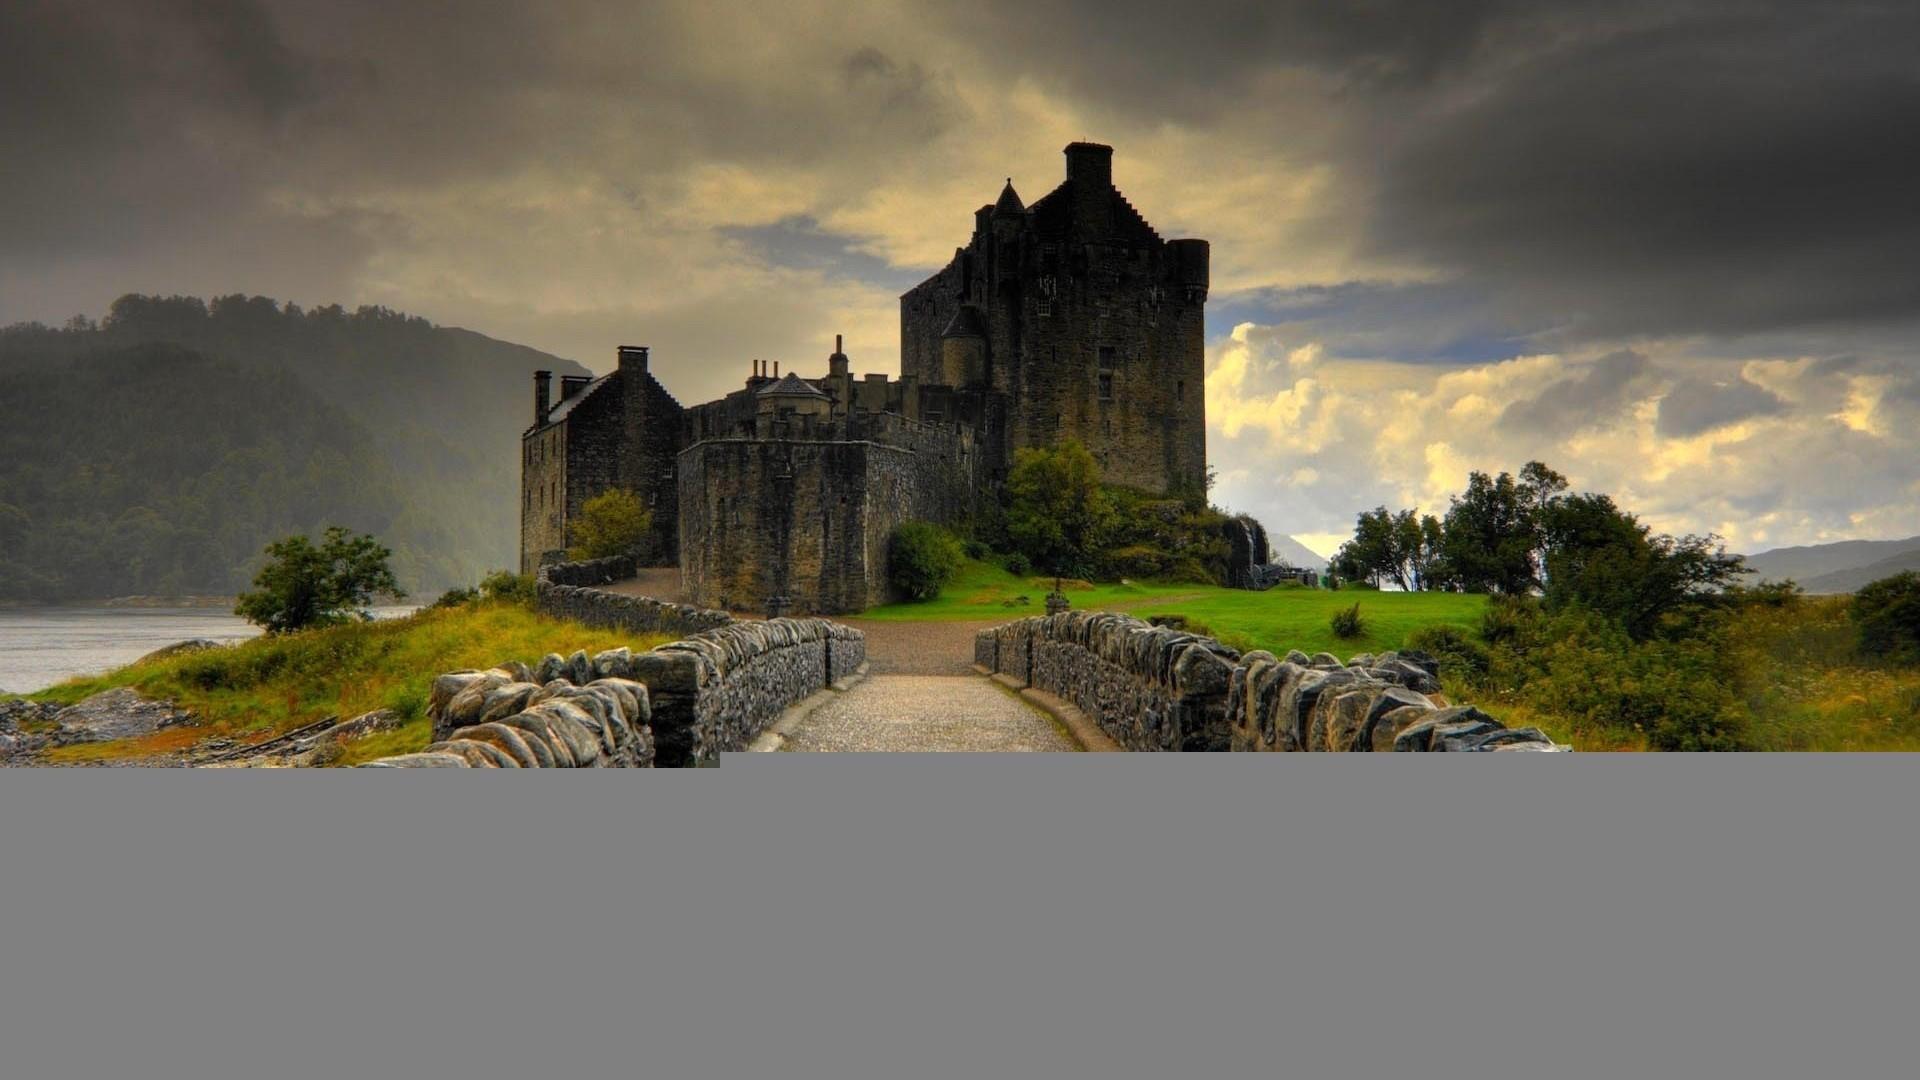 Scotland wallpapers hd 61 images - Scotland wallpaper ...